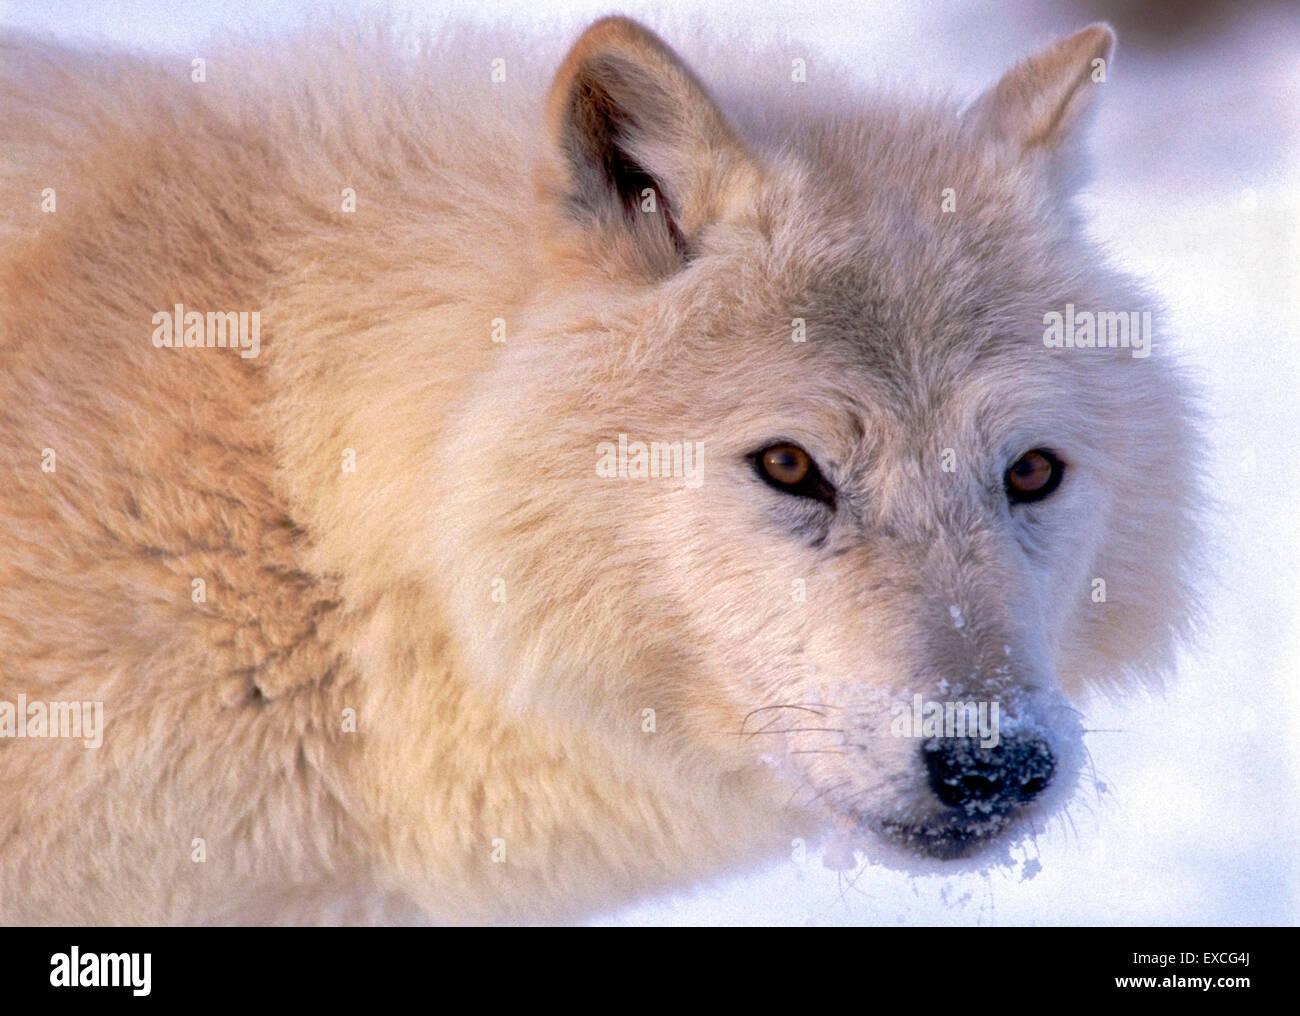 Loup arctique regardant, gros plan portrait Photo Stock